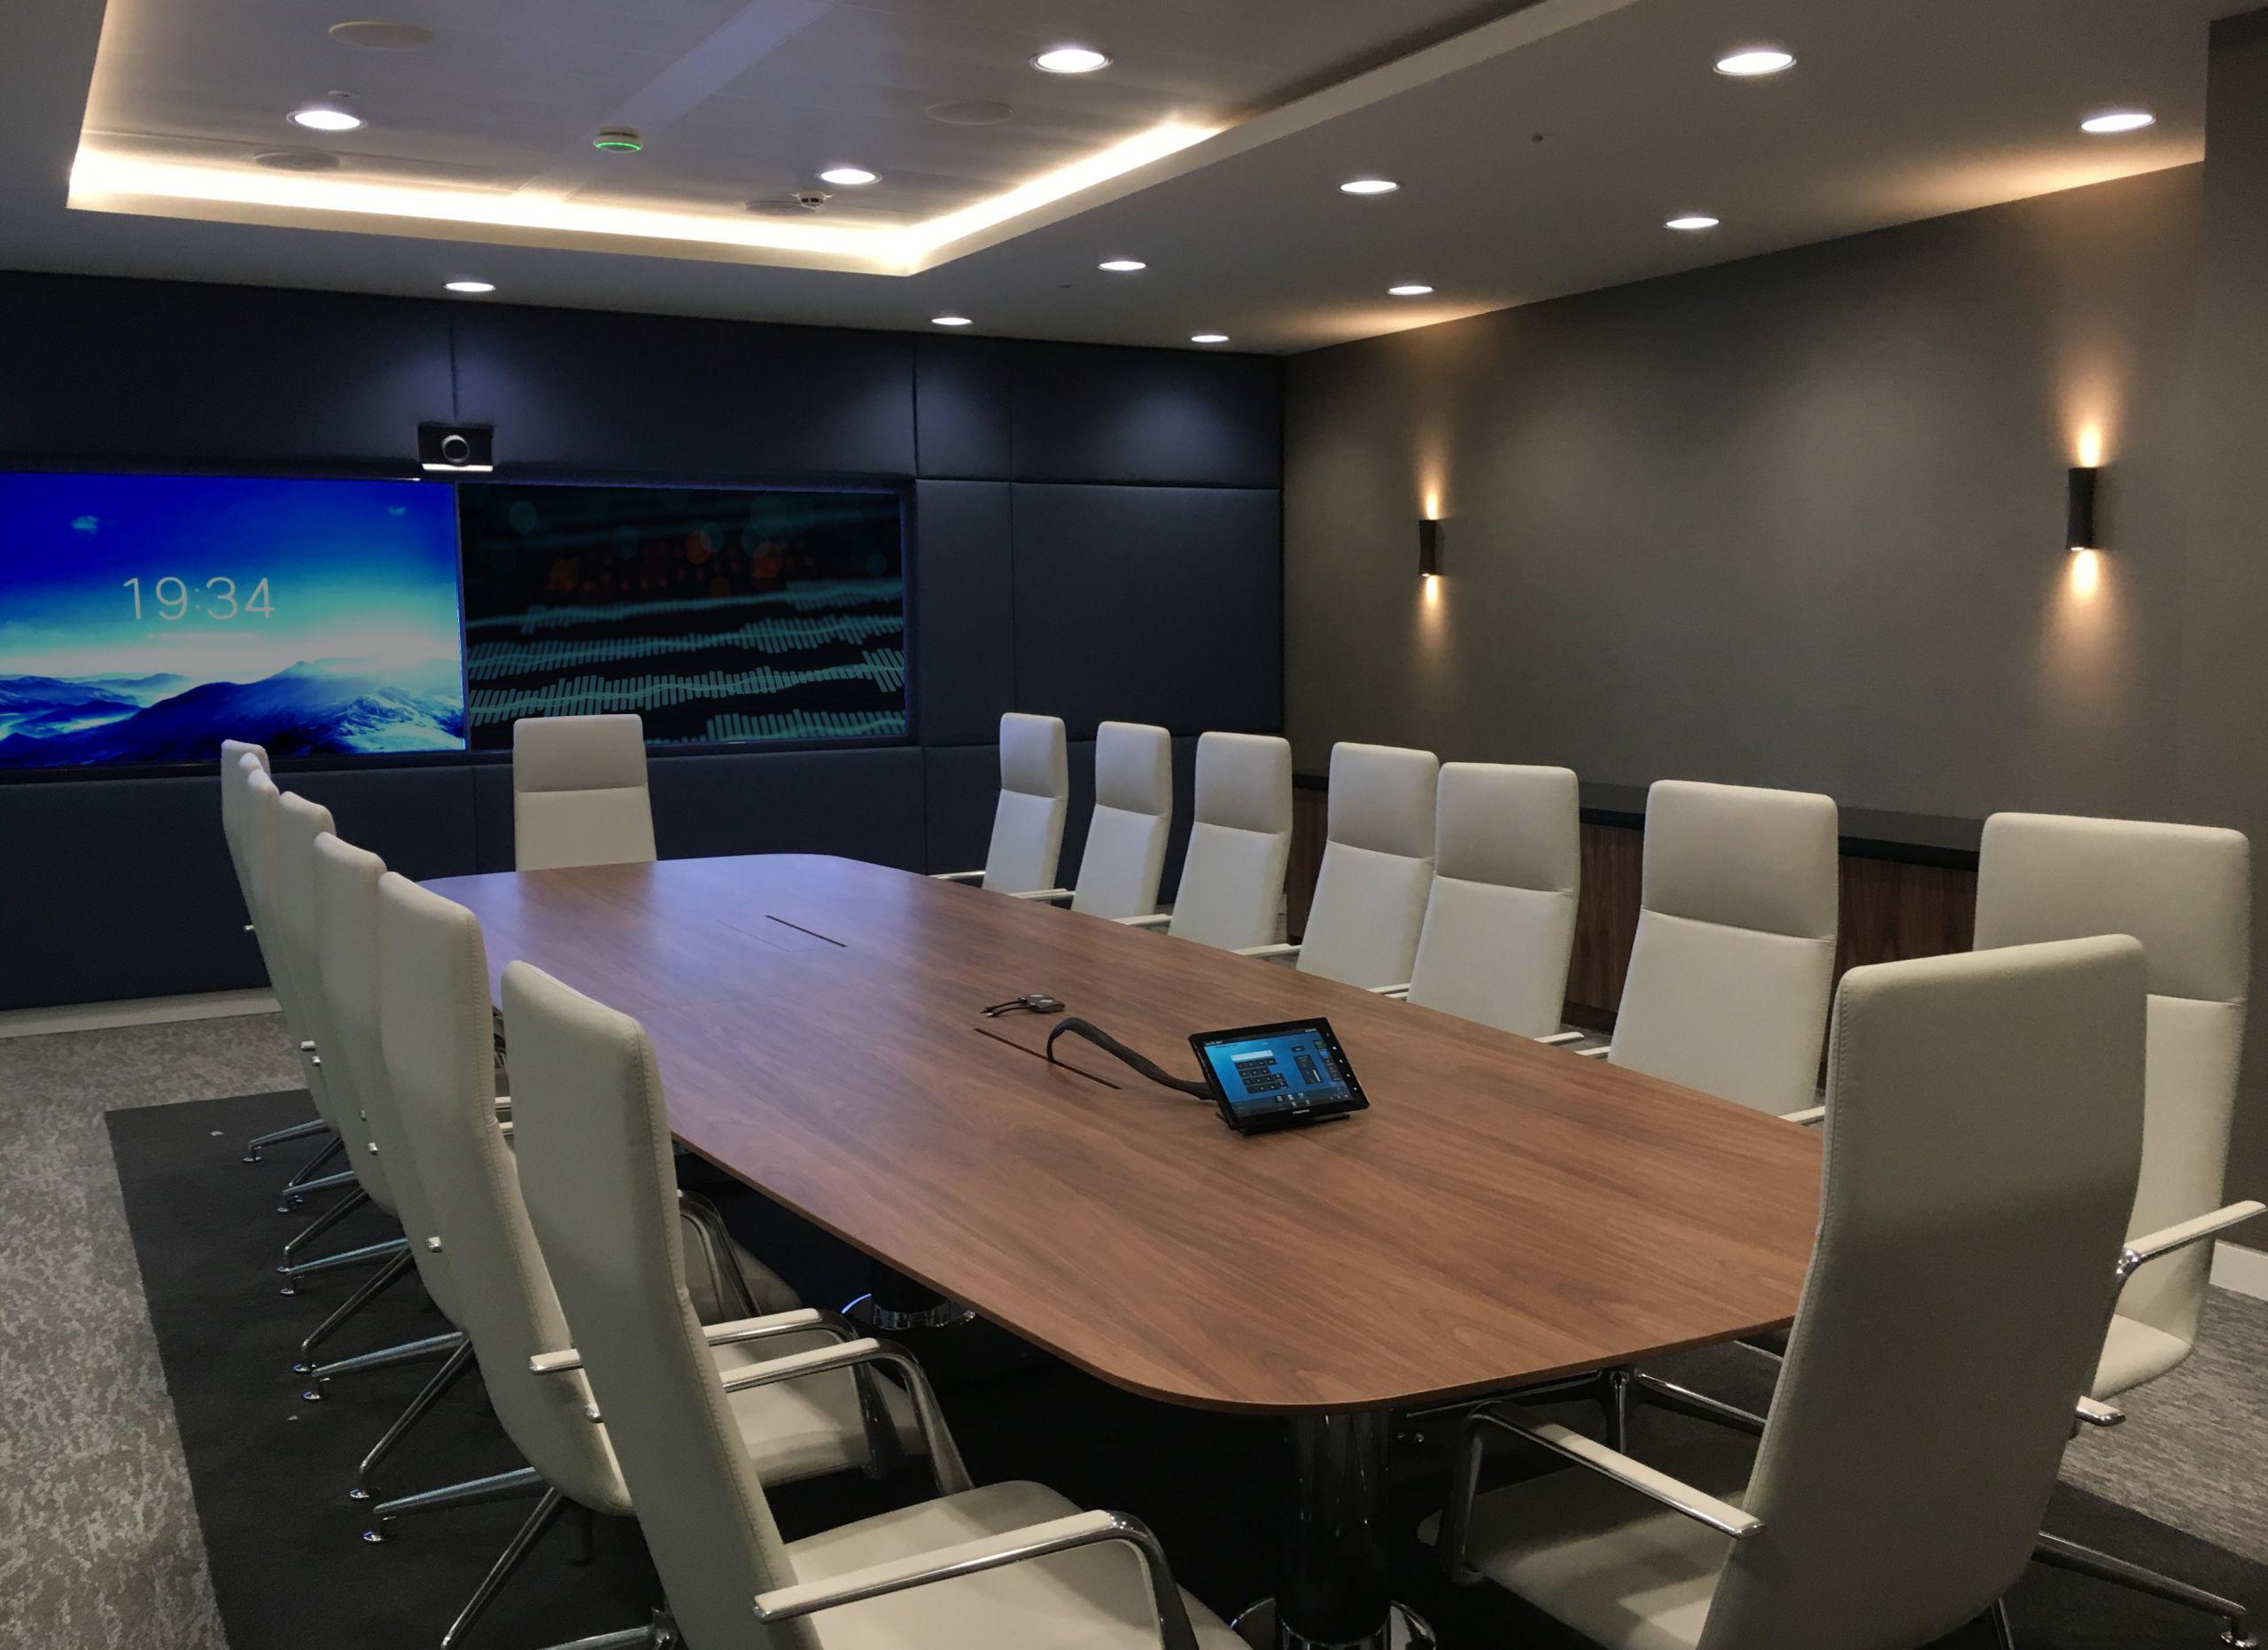 Meeting room with visual audio setup